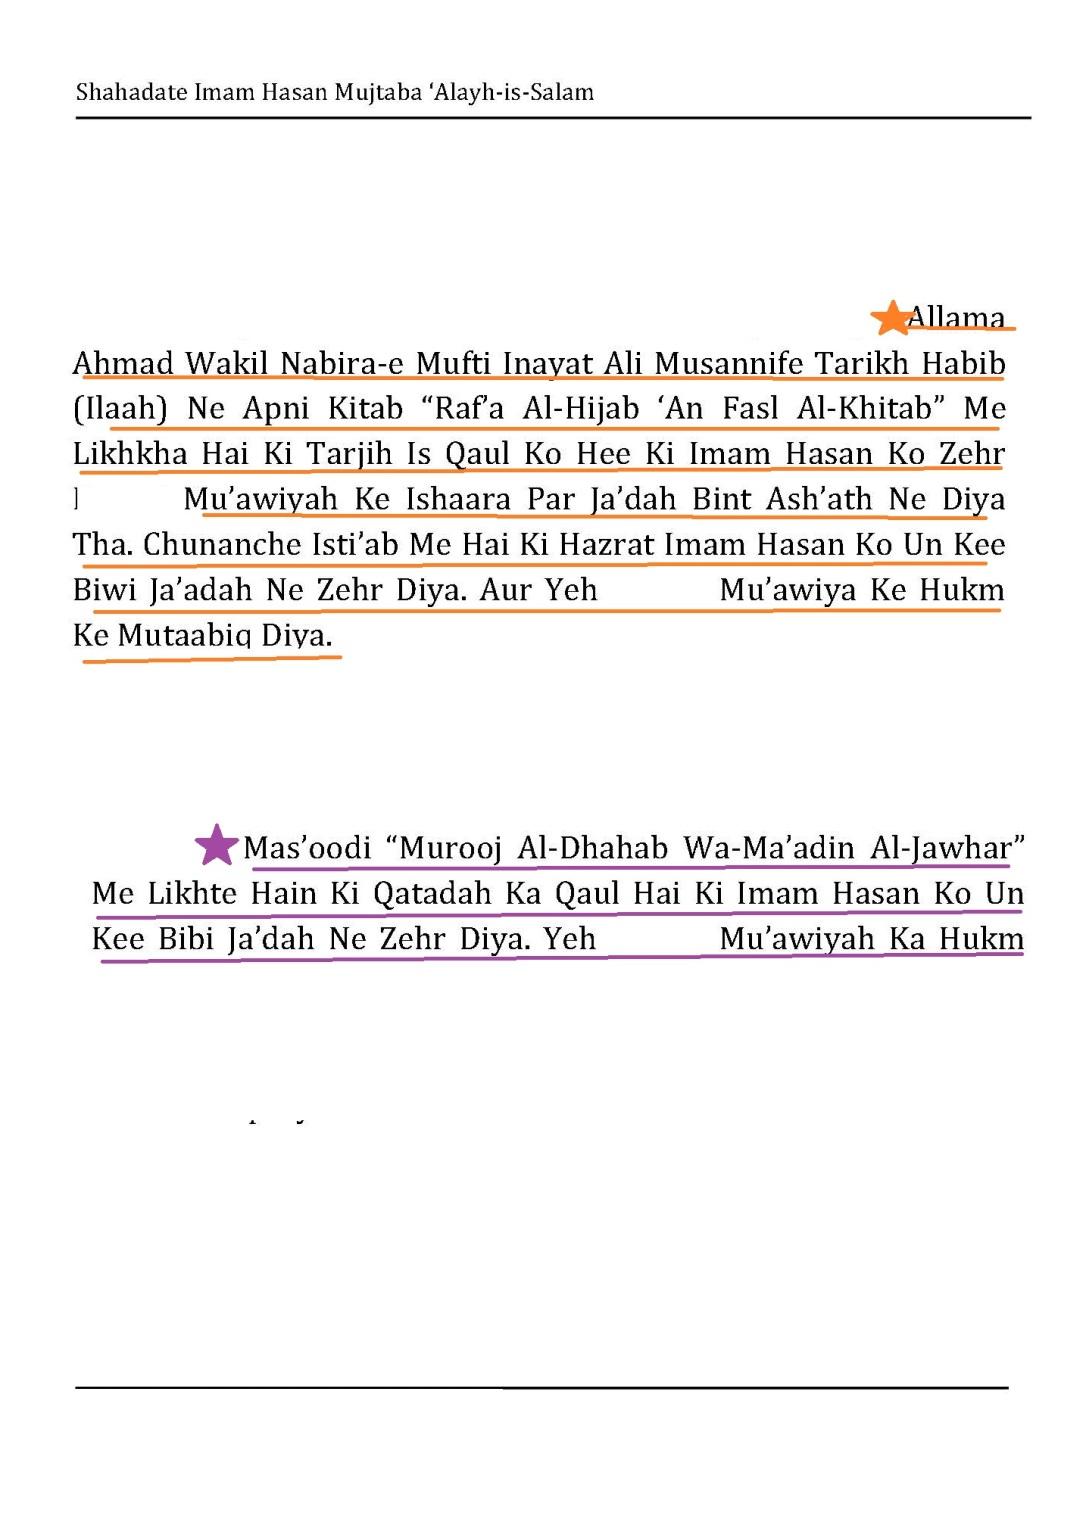 shahadate-imam-hasan-mujtaba-e28098alayh-is-salam-pdf_unlocked_Page_13